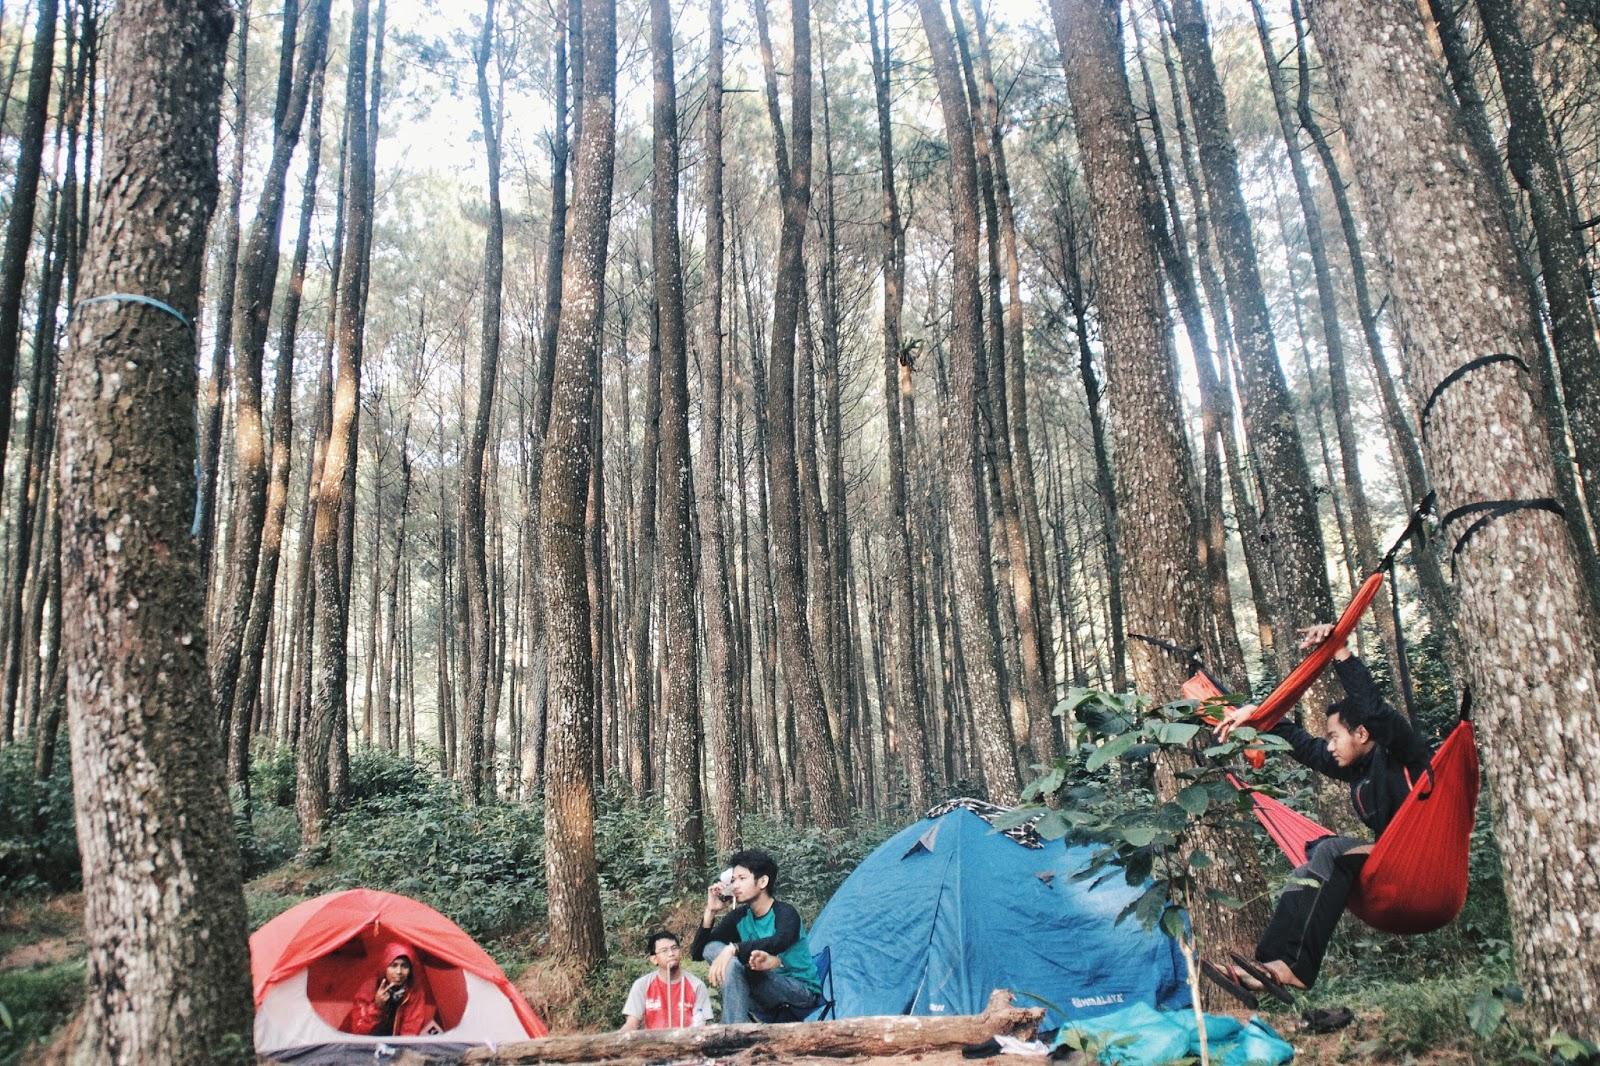 Dekat Jakarta: Melipir ke hutan pinus Loji | Kembara Bukan Fatamorgana